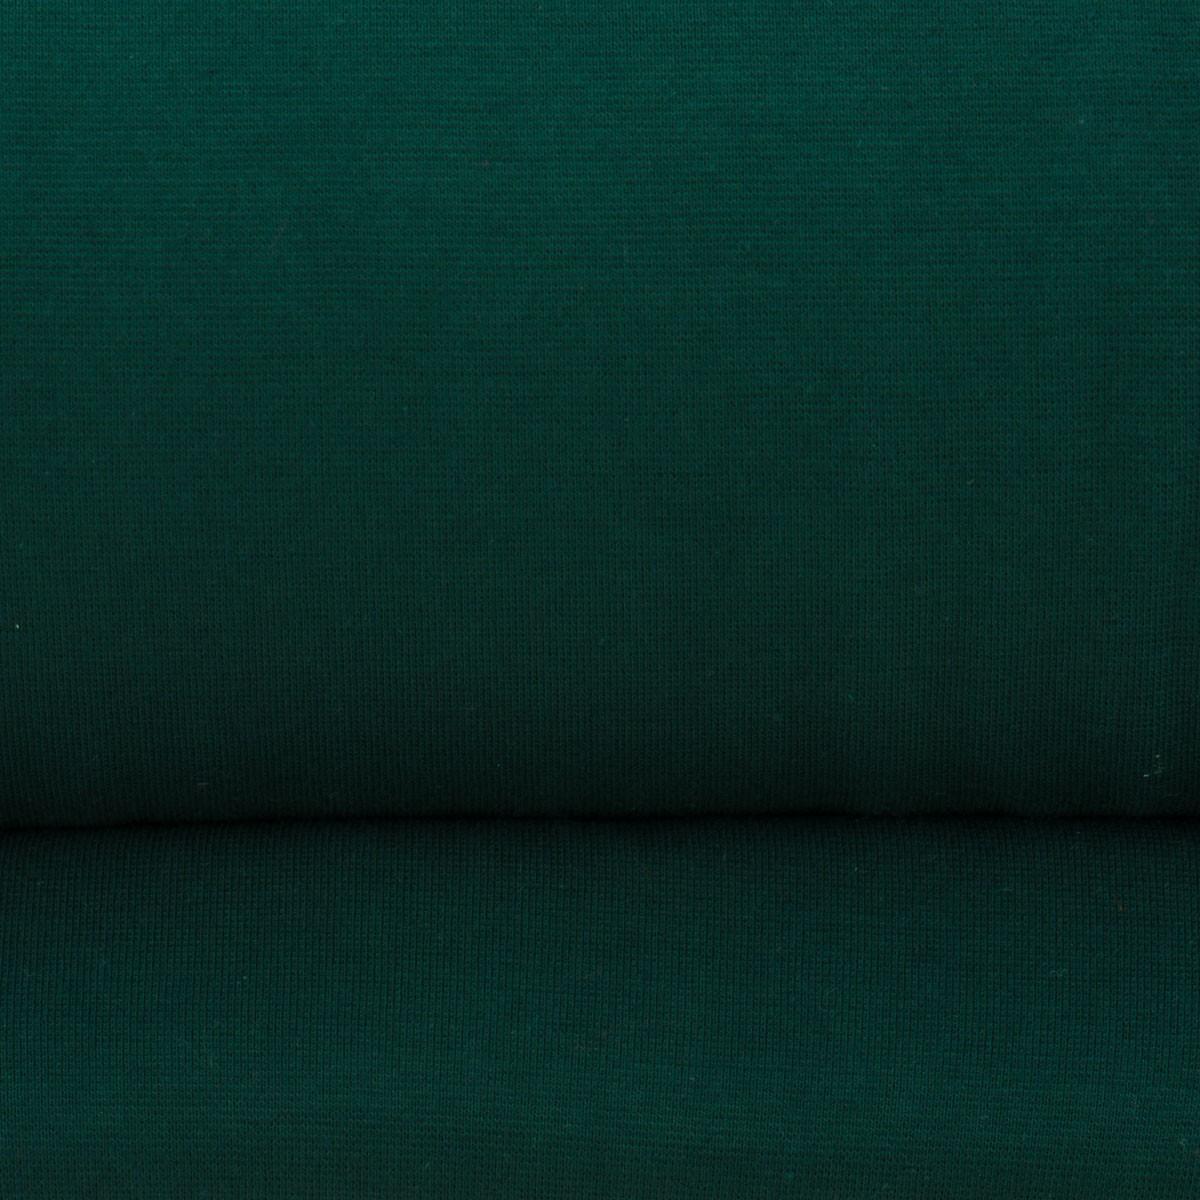 tissu tubulaire bord c te vert fonc. Black Bedroom Furniture Sets. Home Design Ideas